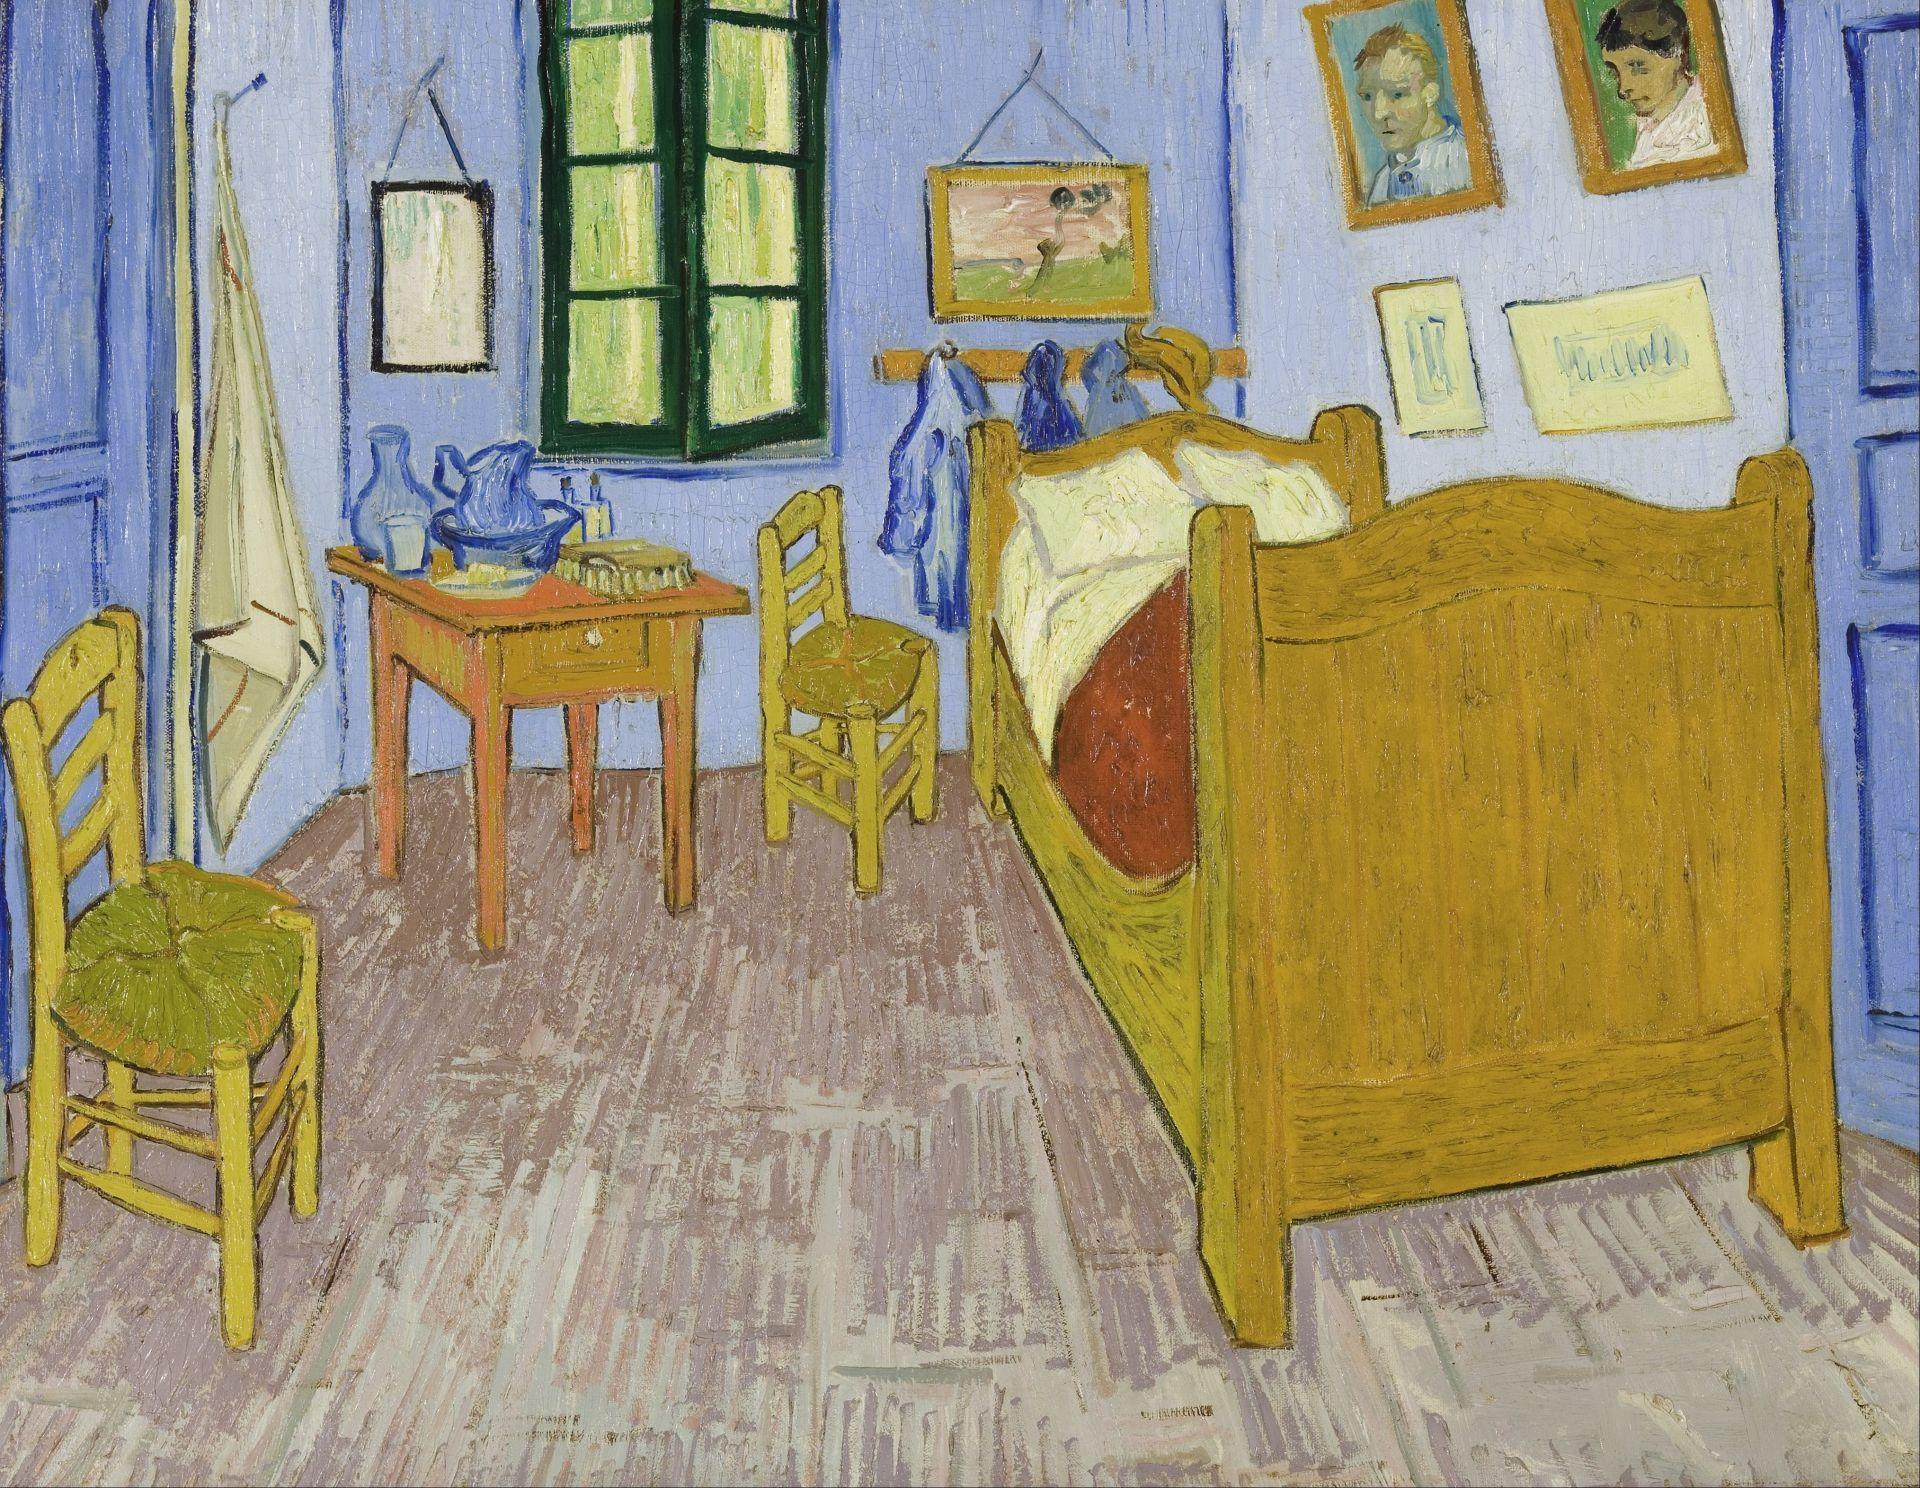 Vincent_van_Gogh_-_Van_Gogh's_Bedroom_in_Arles_-_Google_Art_Project